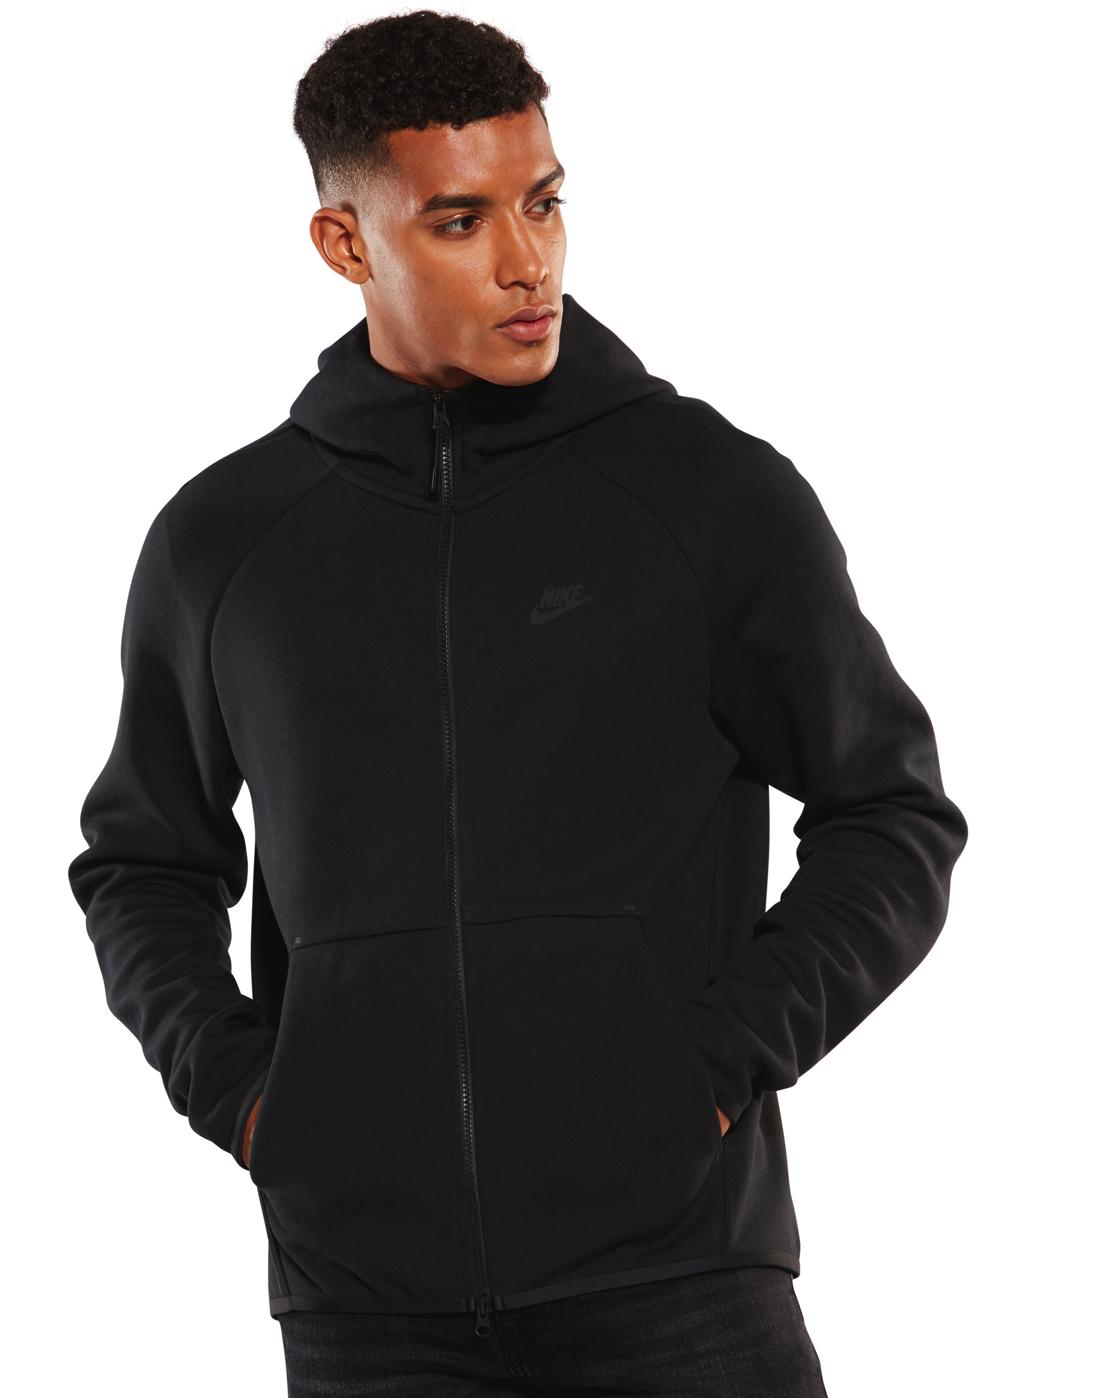 0841f0328694 Nike Mens Tech Fleece Full Zip Hoody